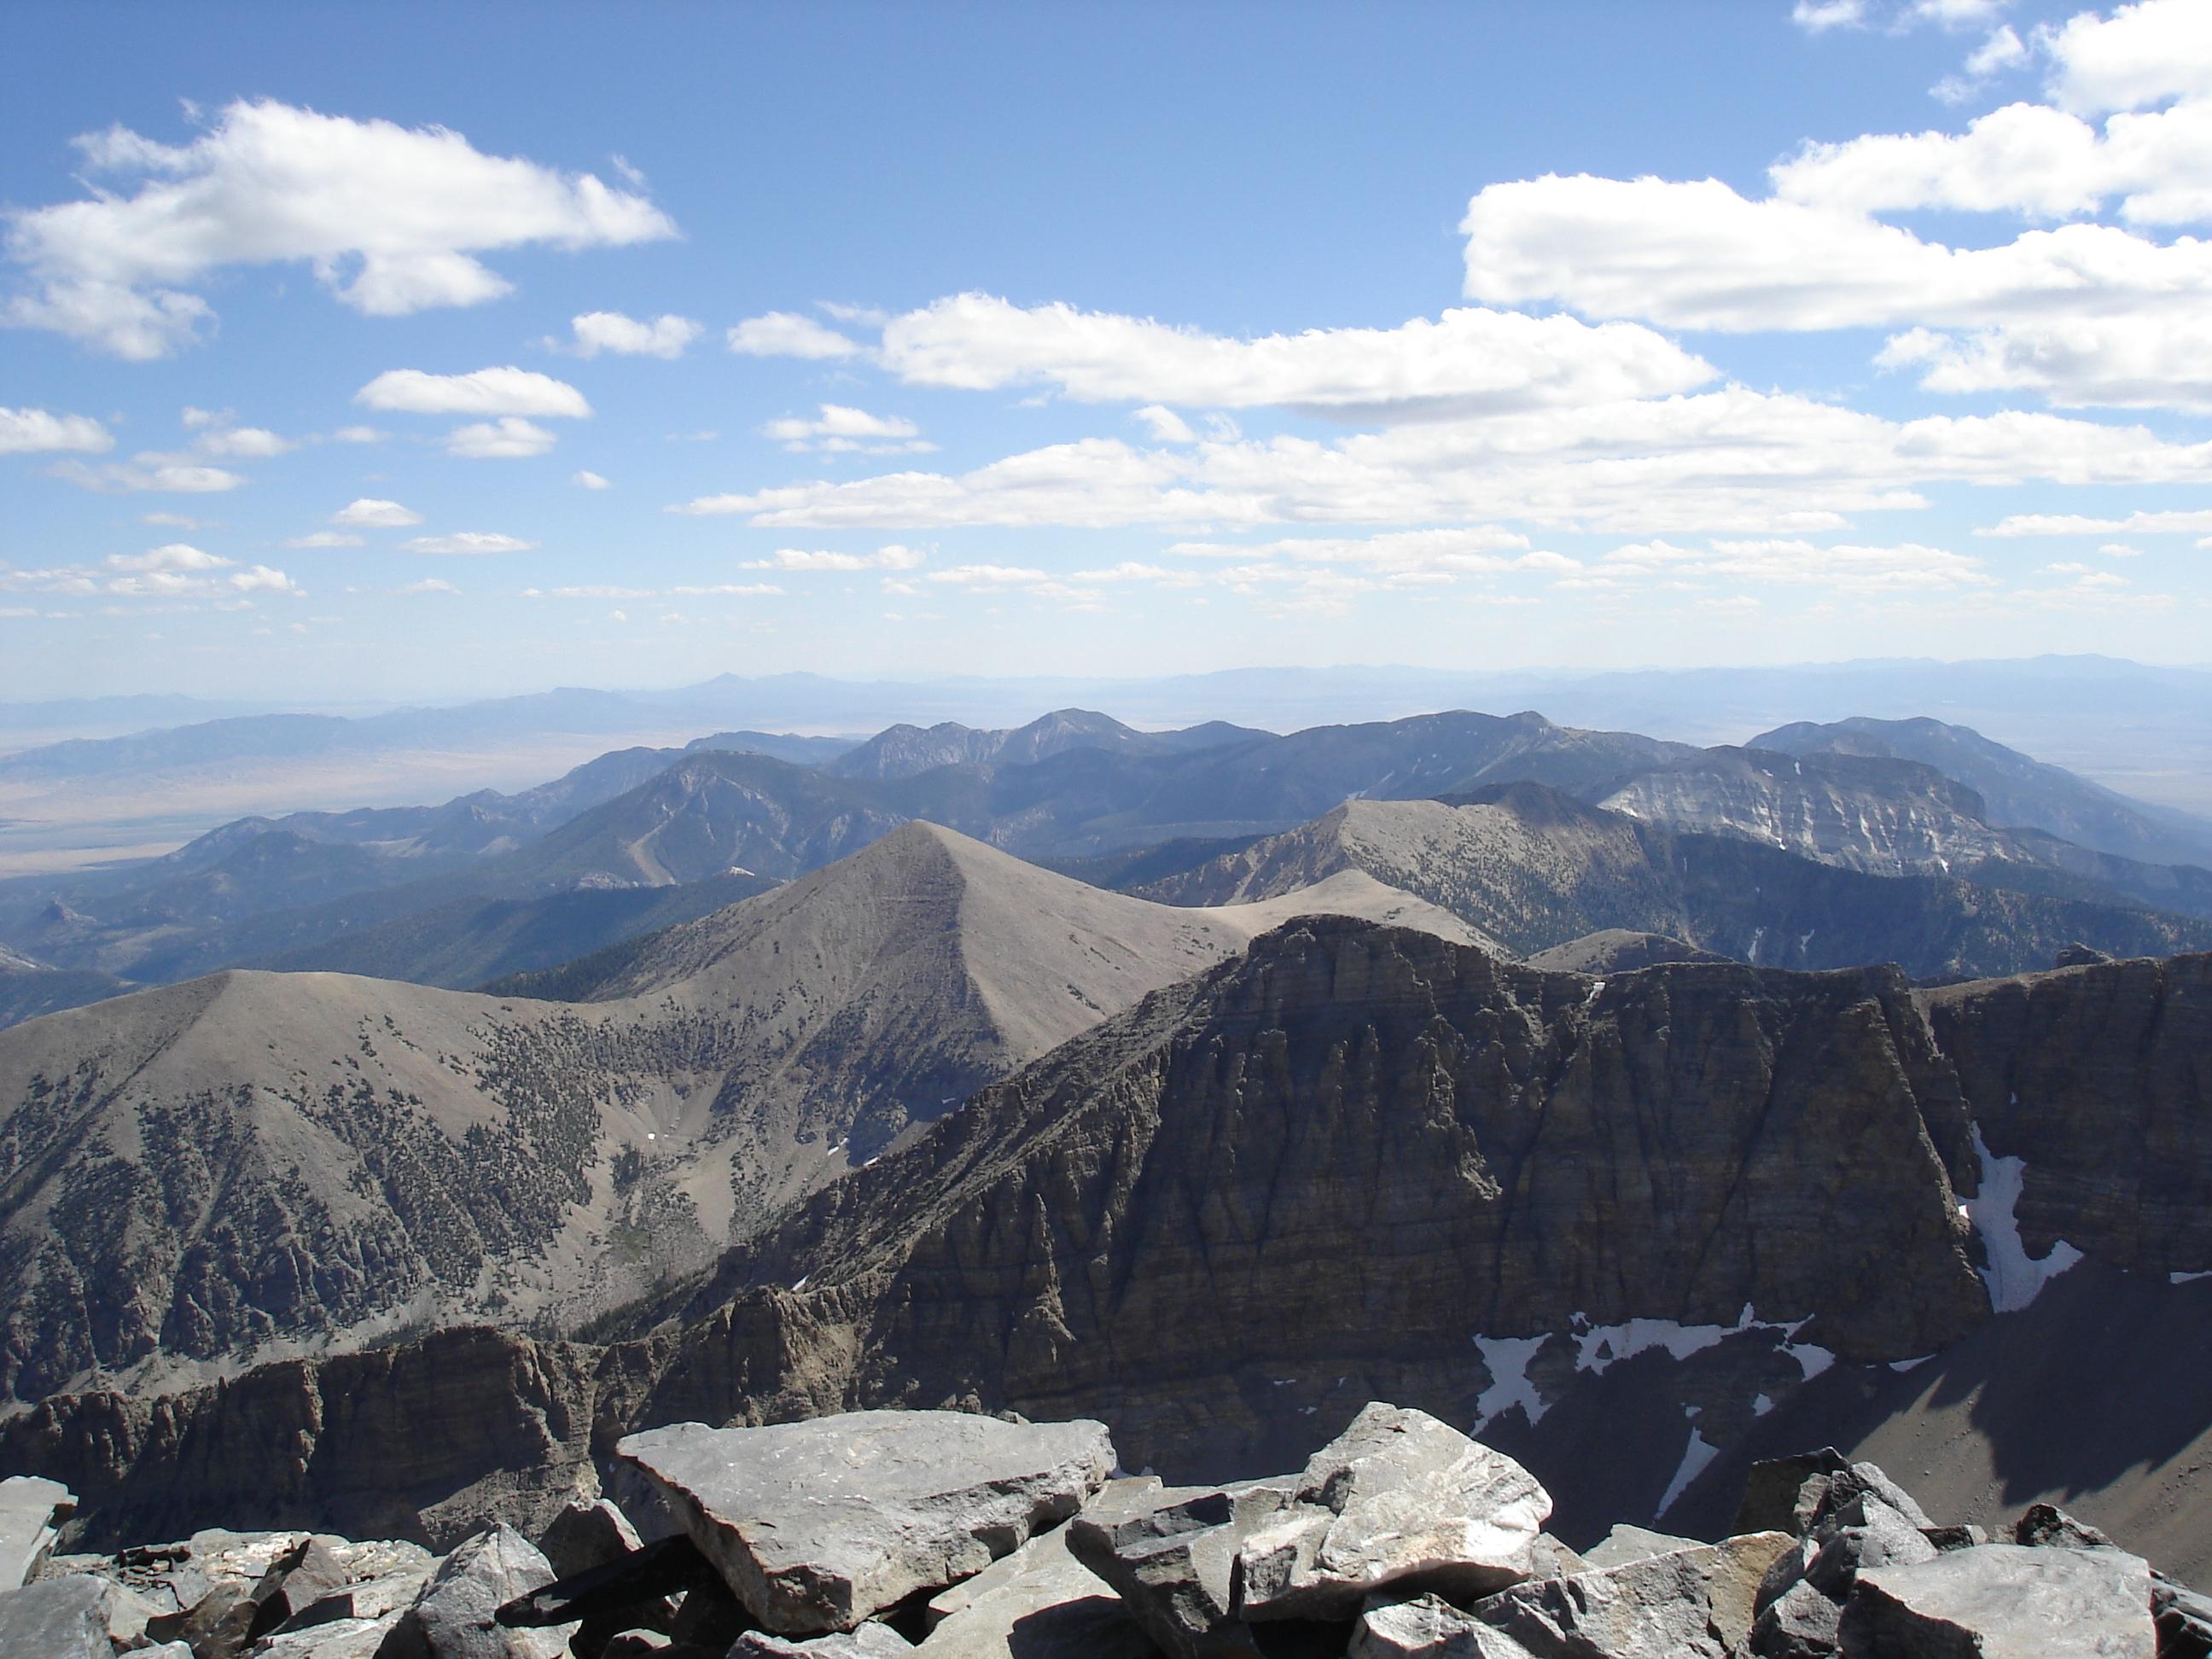 Inventory Monitoring At Great Basin National Park U S National Park Service